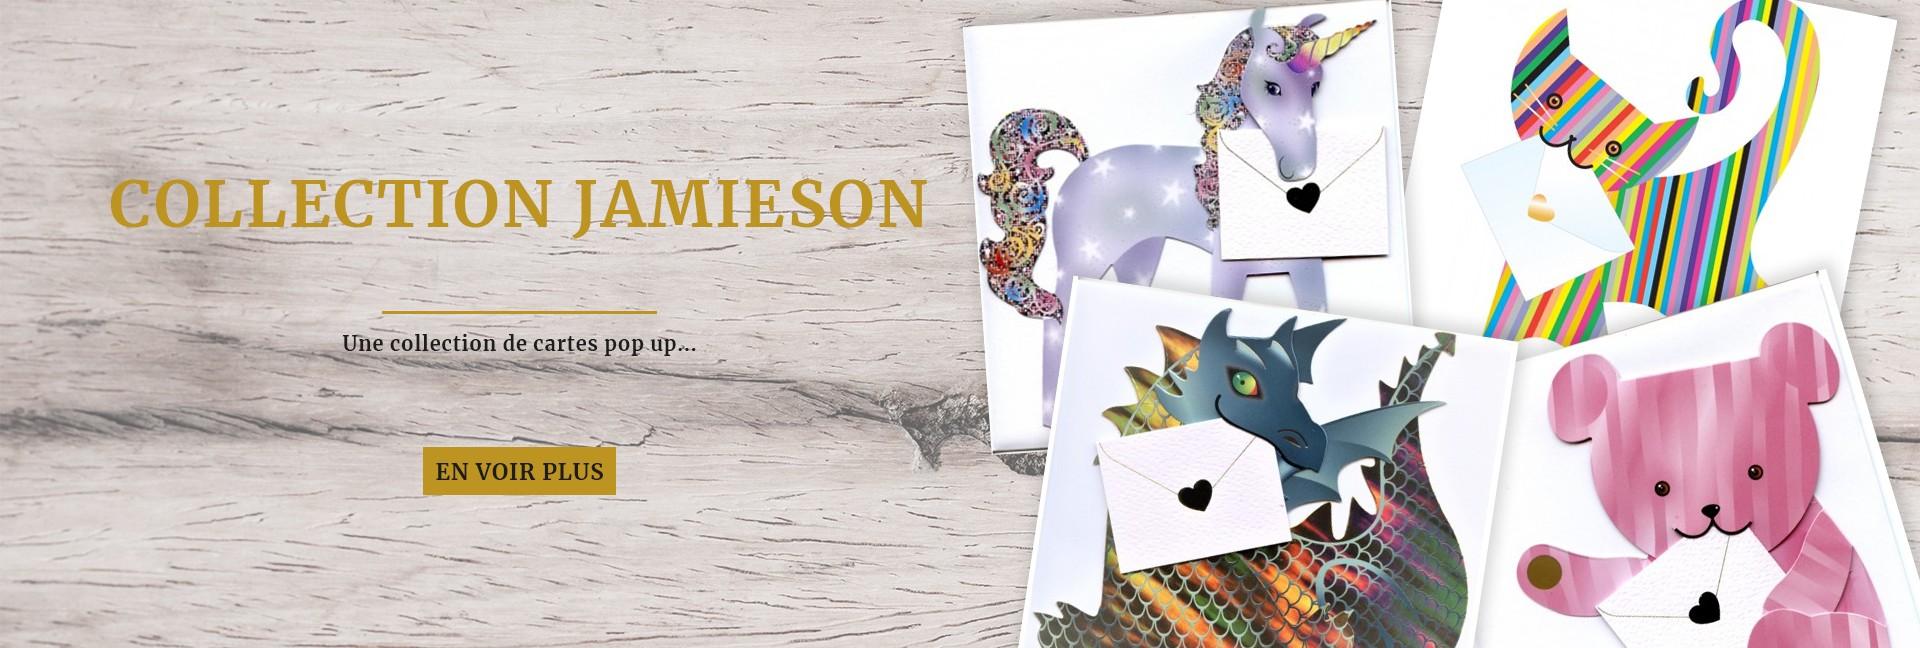 Collection Jamieson